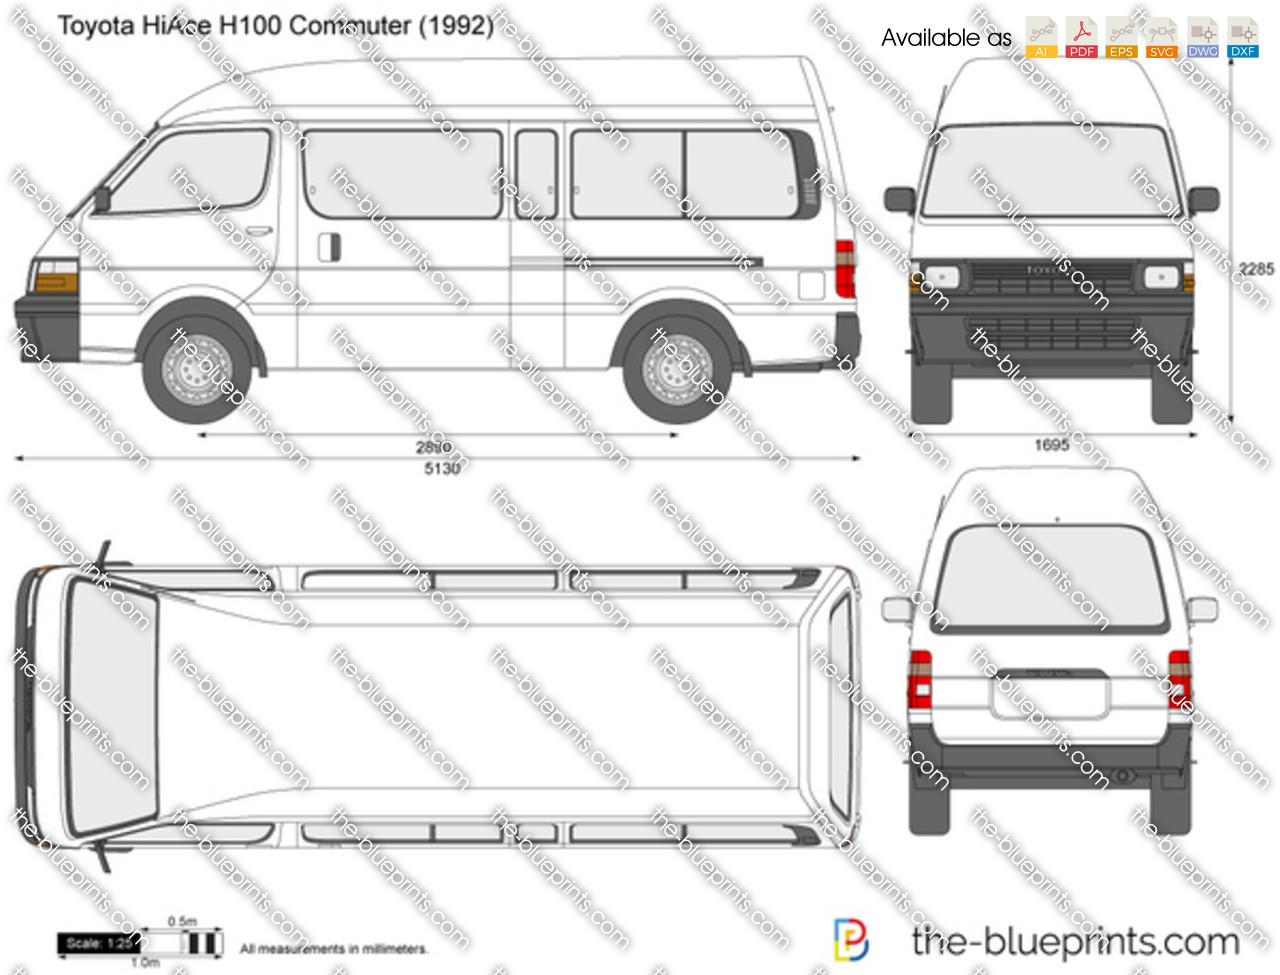 Toyota HiAce H100 Commuter 2018